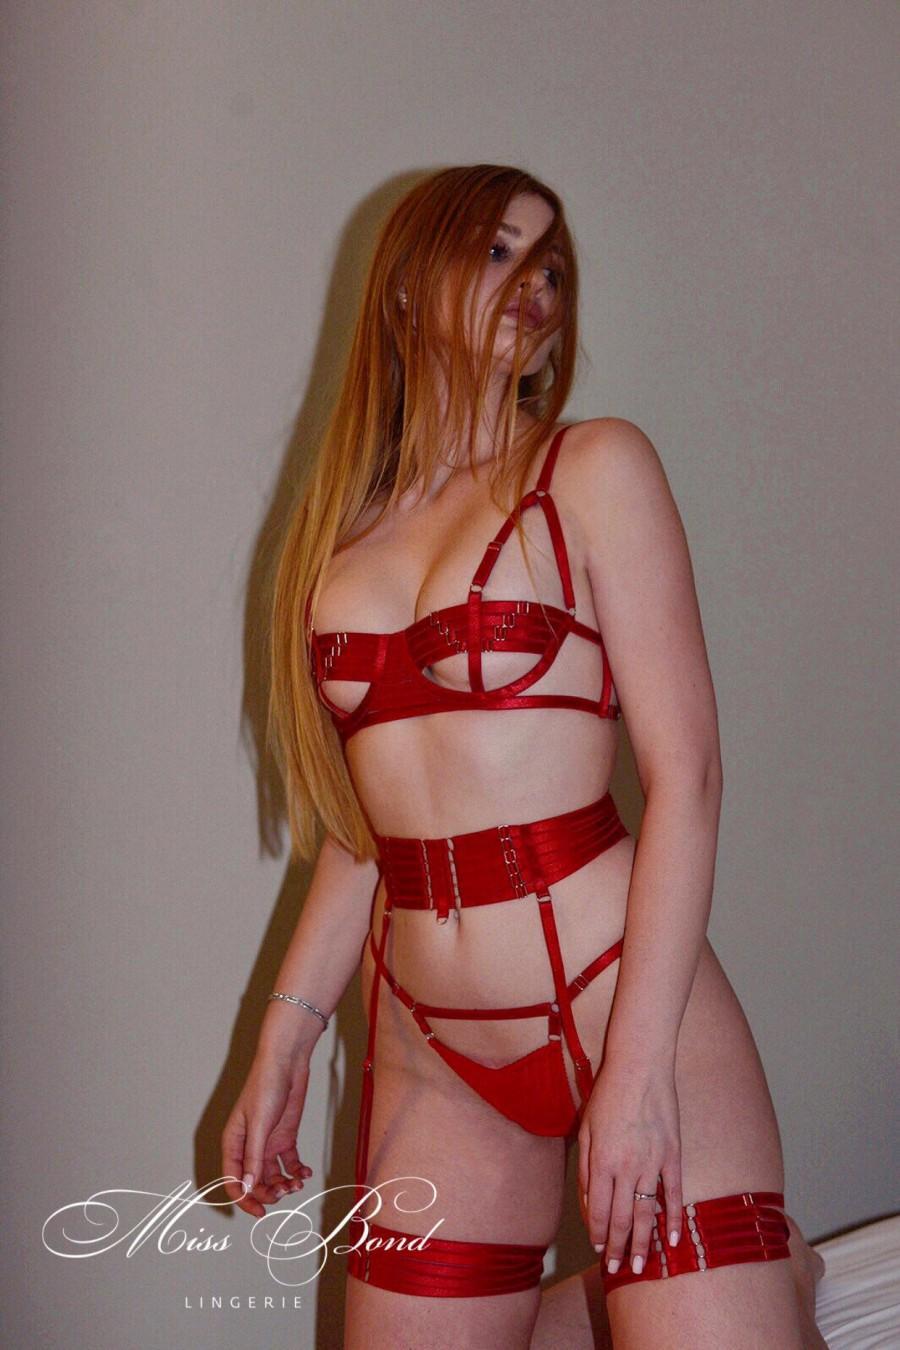 Wedding - Red harness lingerie set, see through lingerie, sexy lingerie, sheer erotic lingerie, bdsm lingerie, wedding bridal honeymoon lingerie